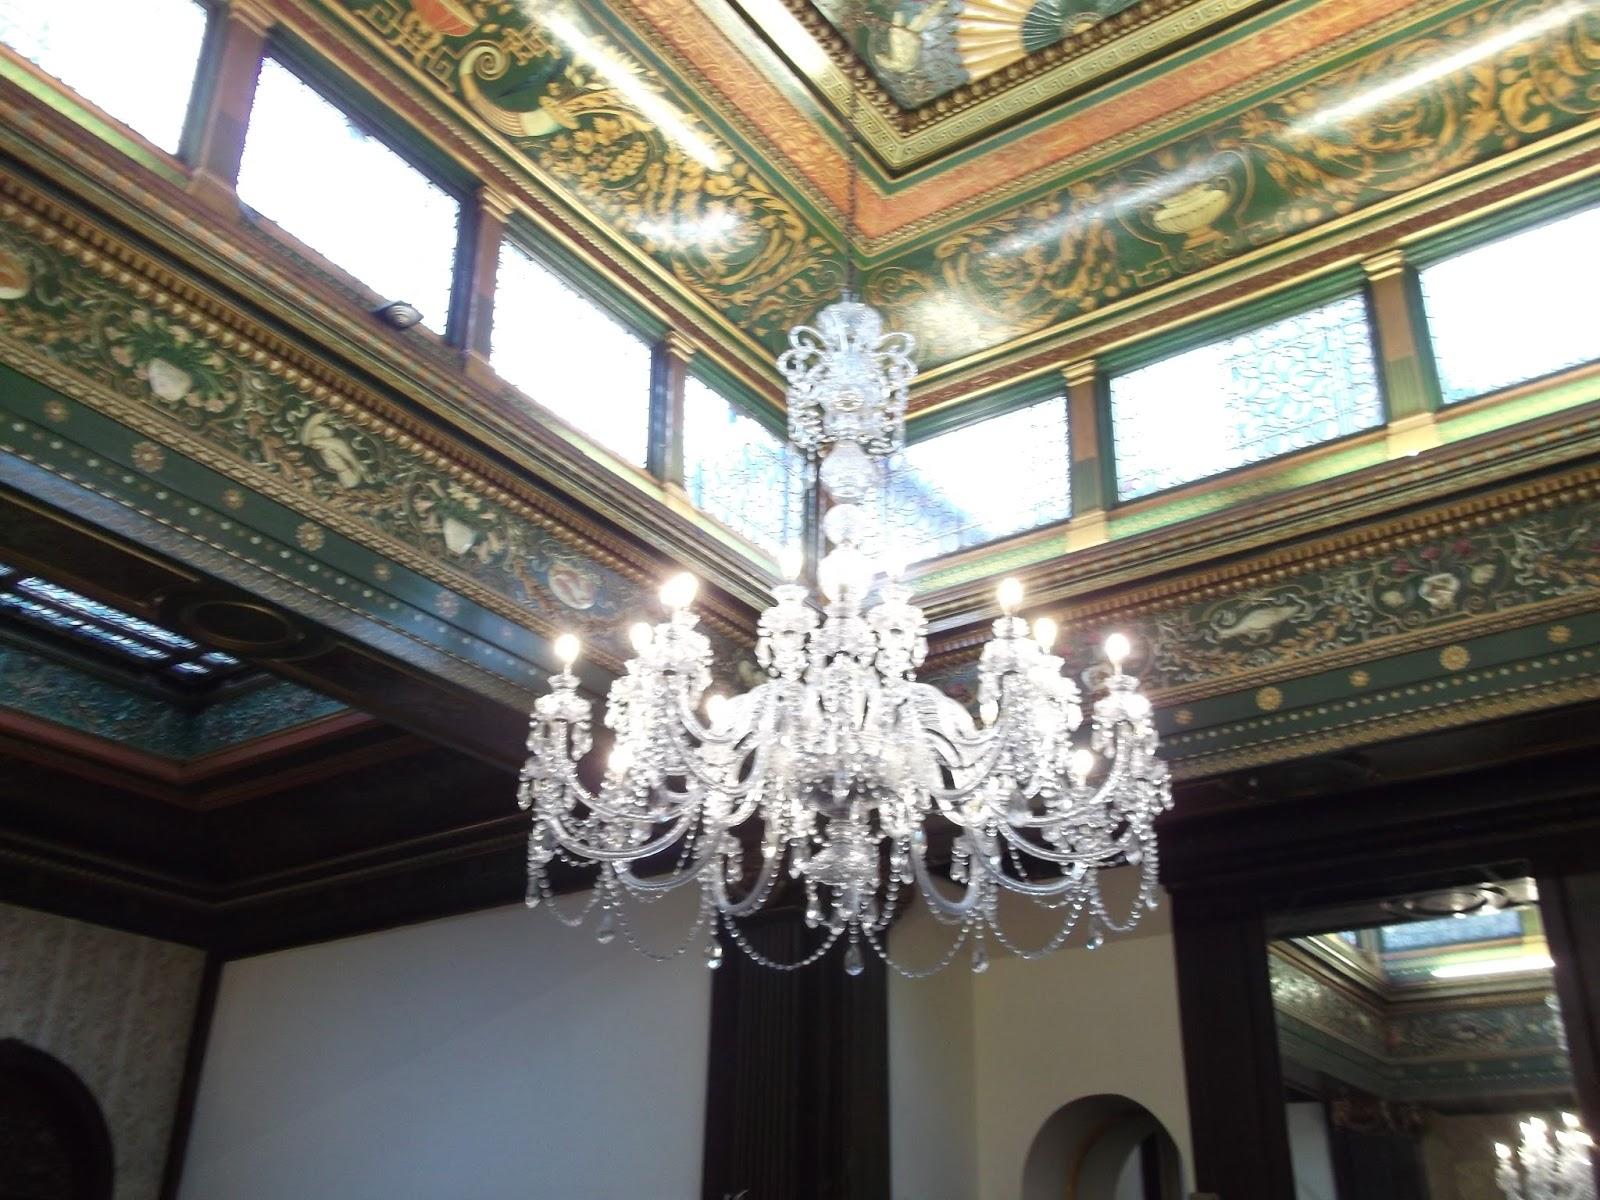 Wortley Hall Dining Room